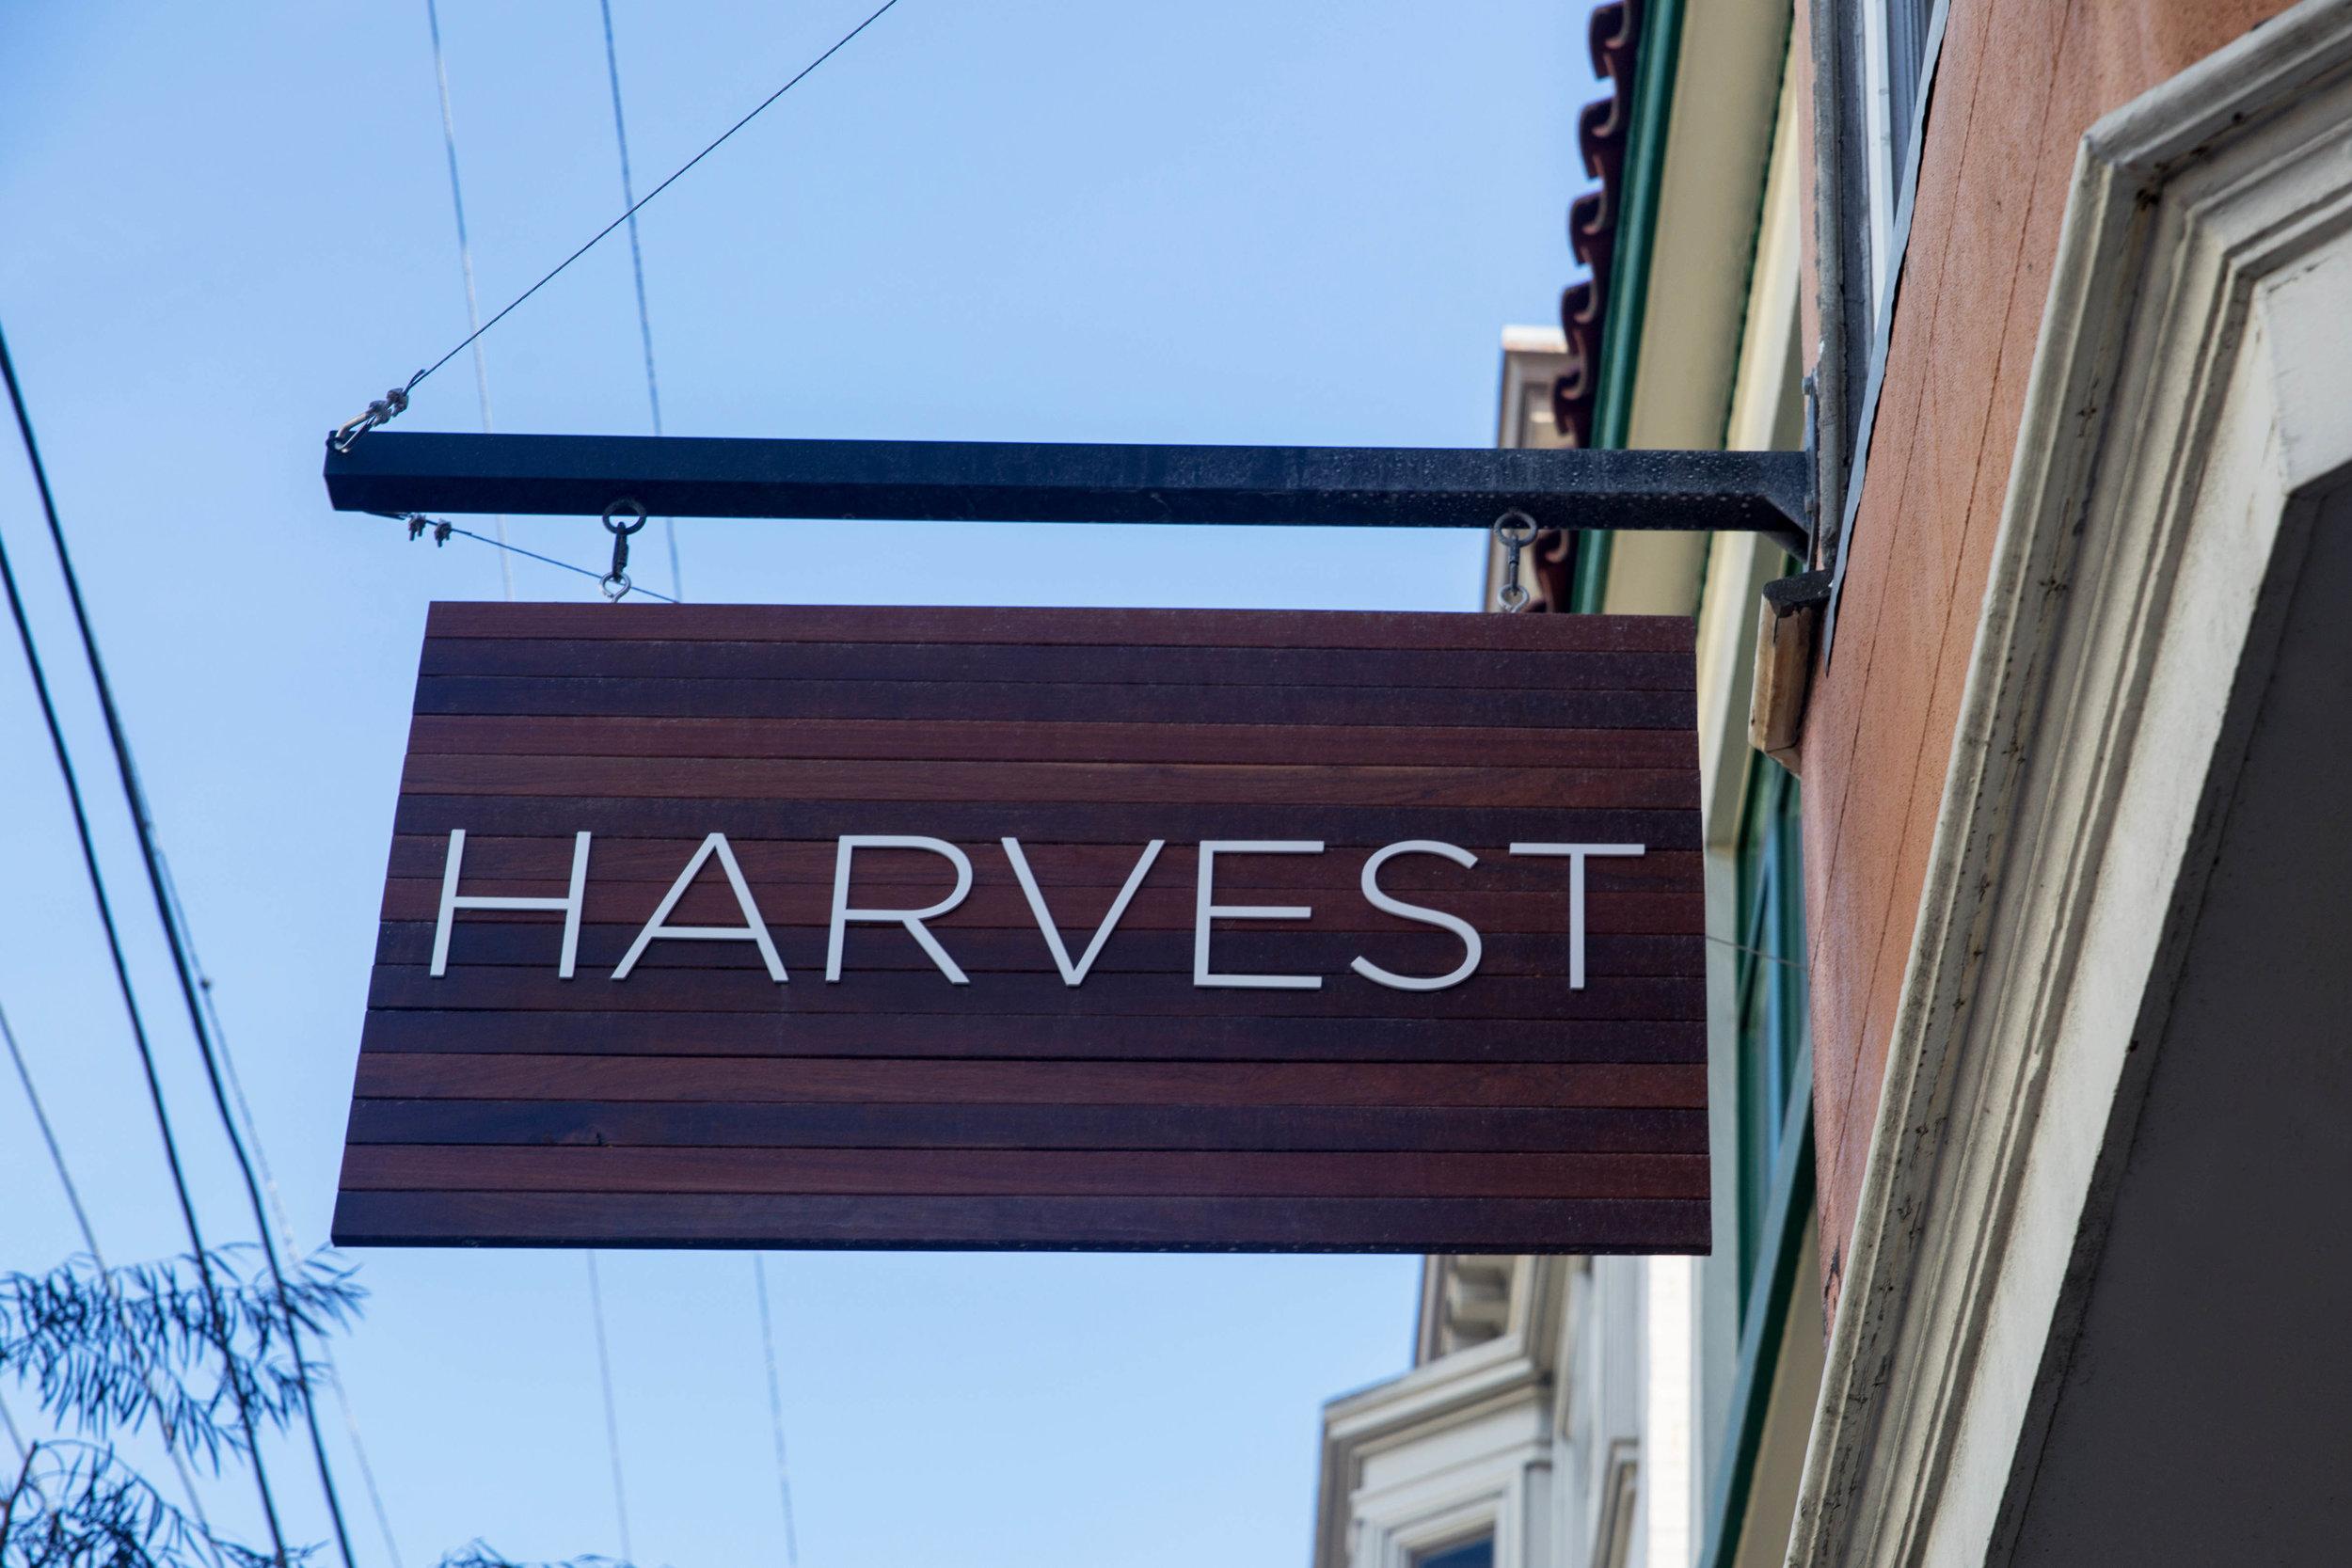 HARVEST  - 37a 29TH STREET - 415.814.3273